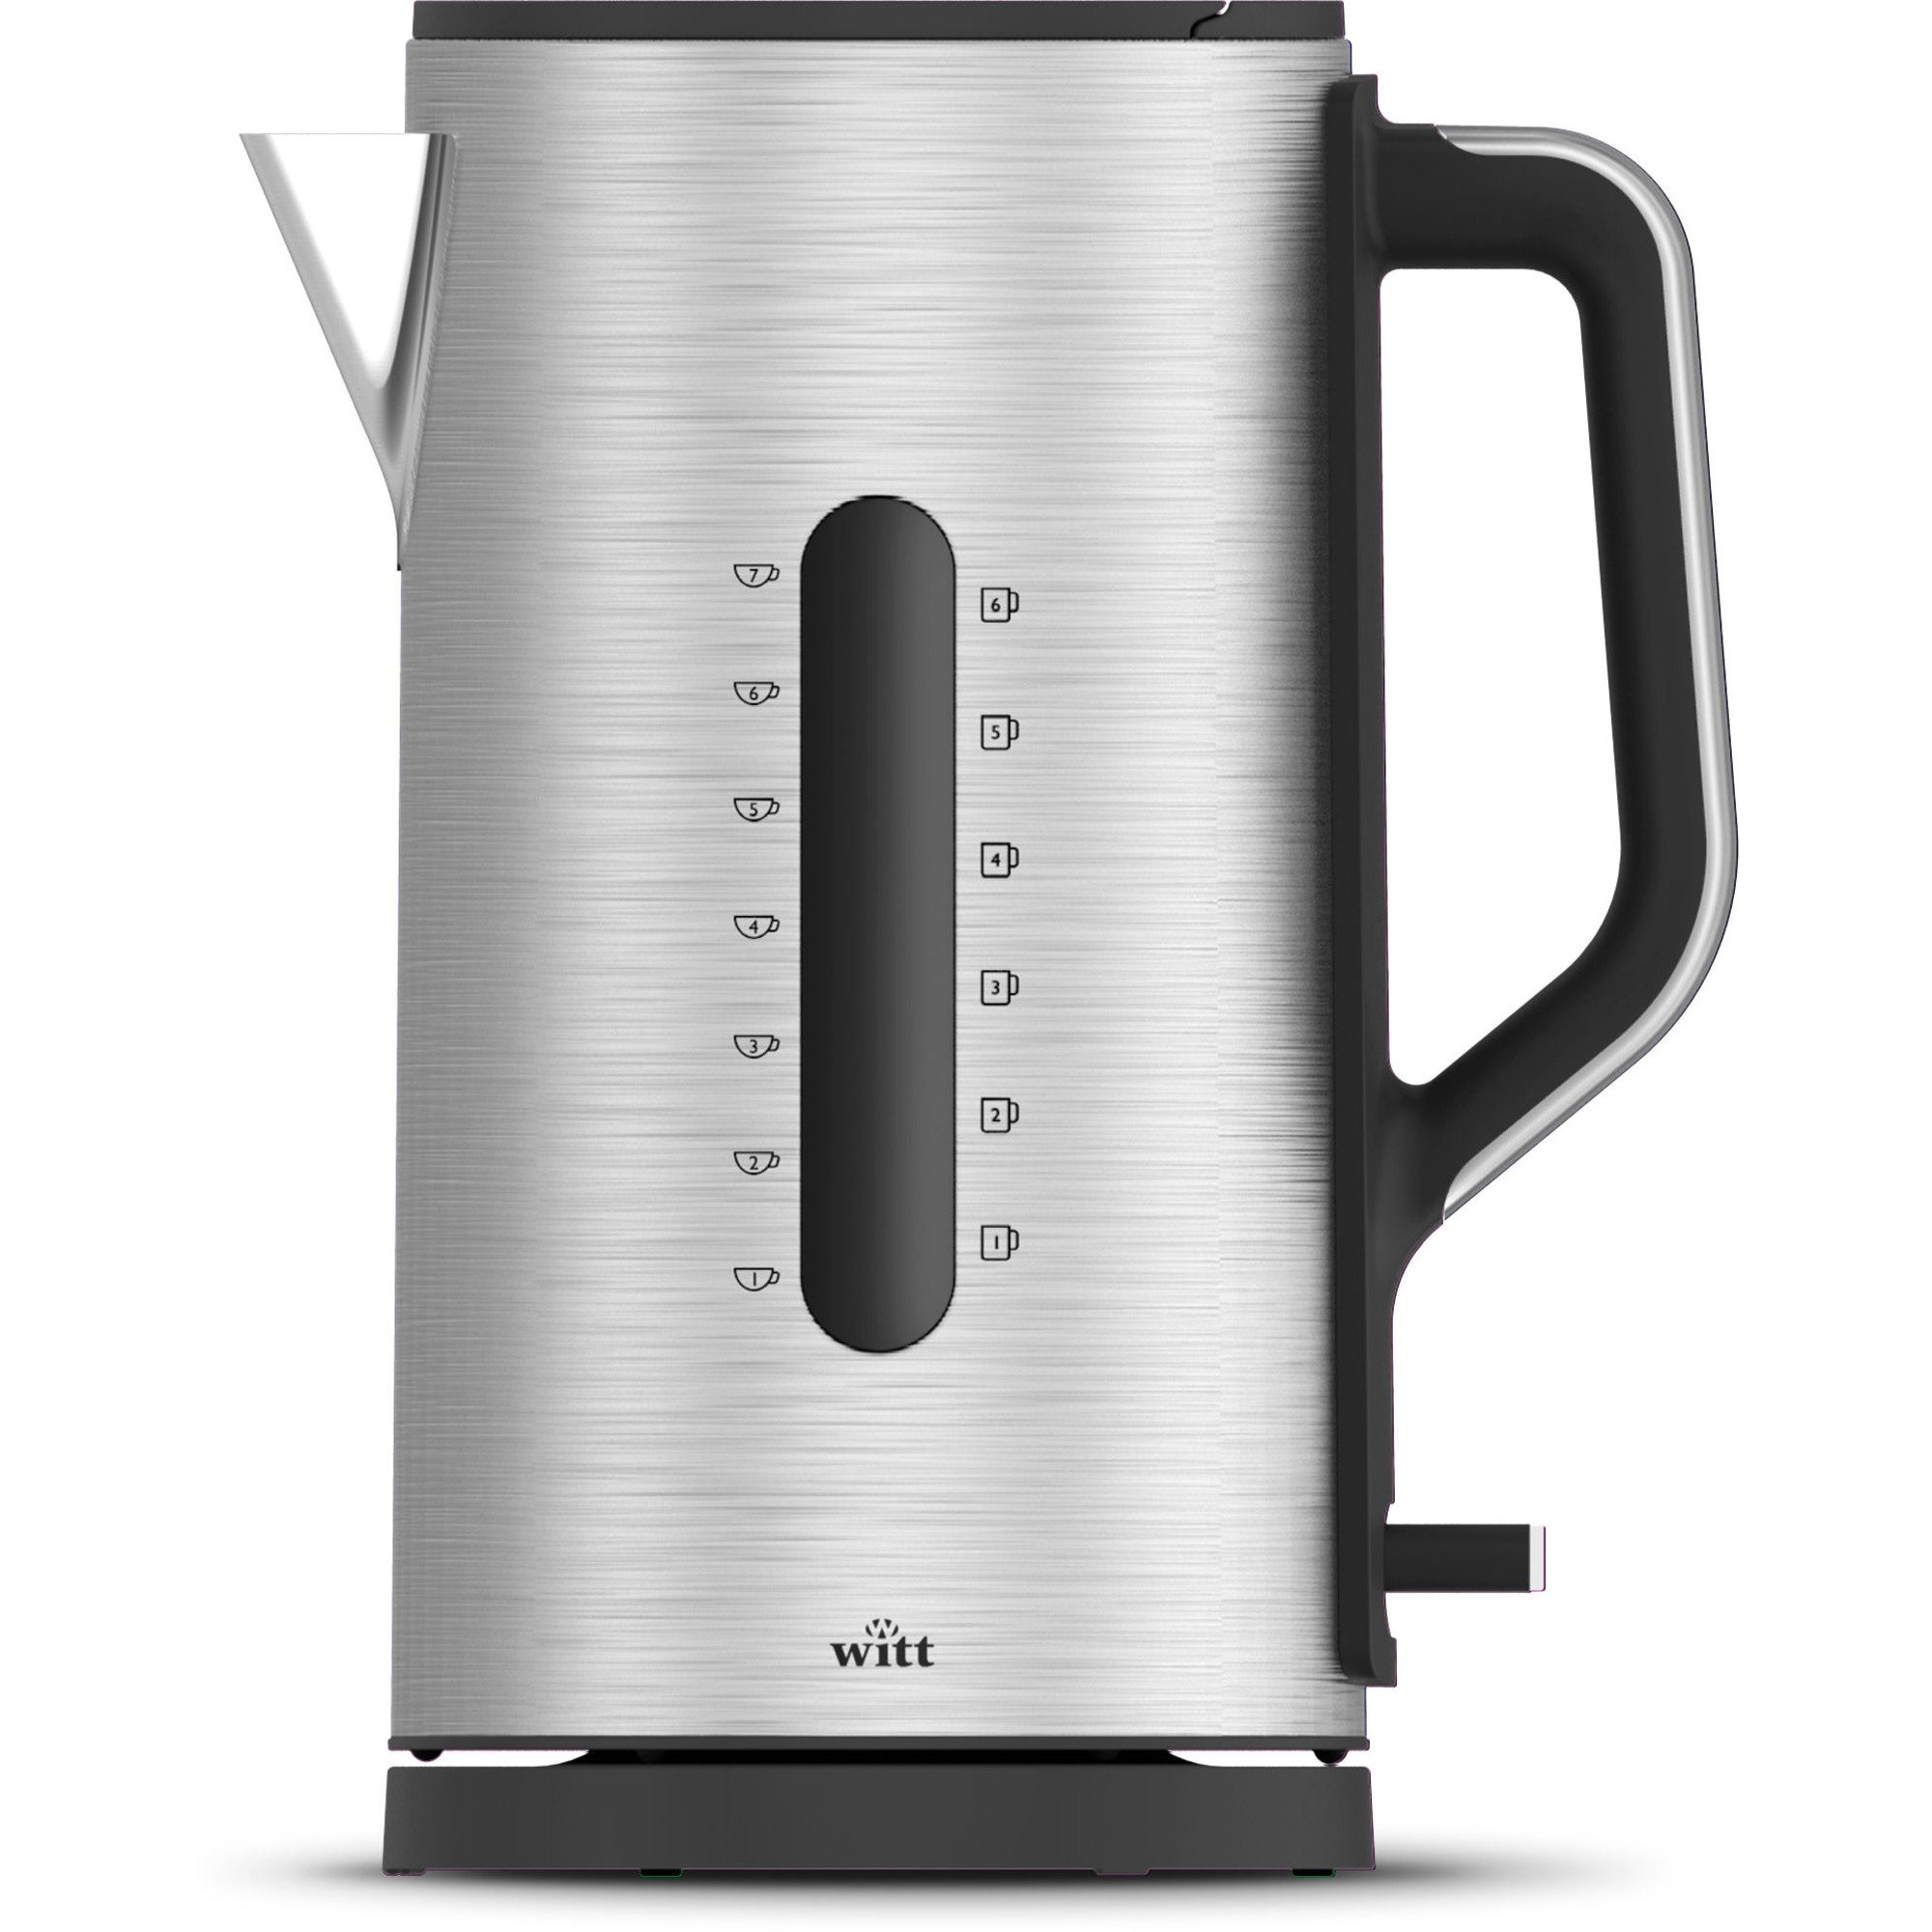 Witt Premium vattenkokare 17 liter Rostfritt stål